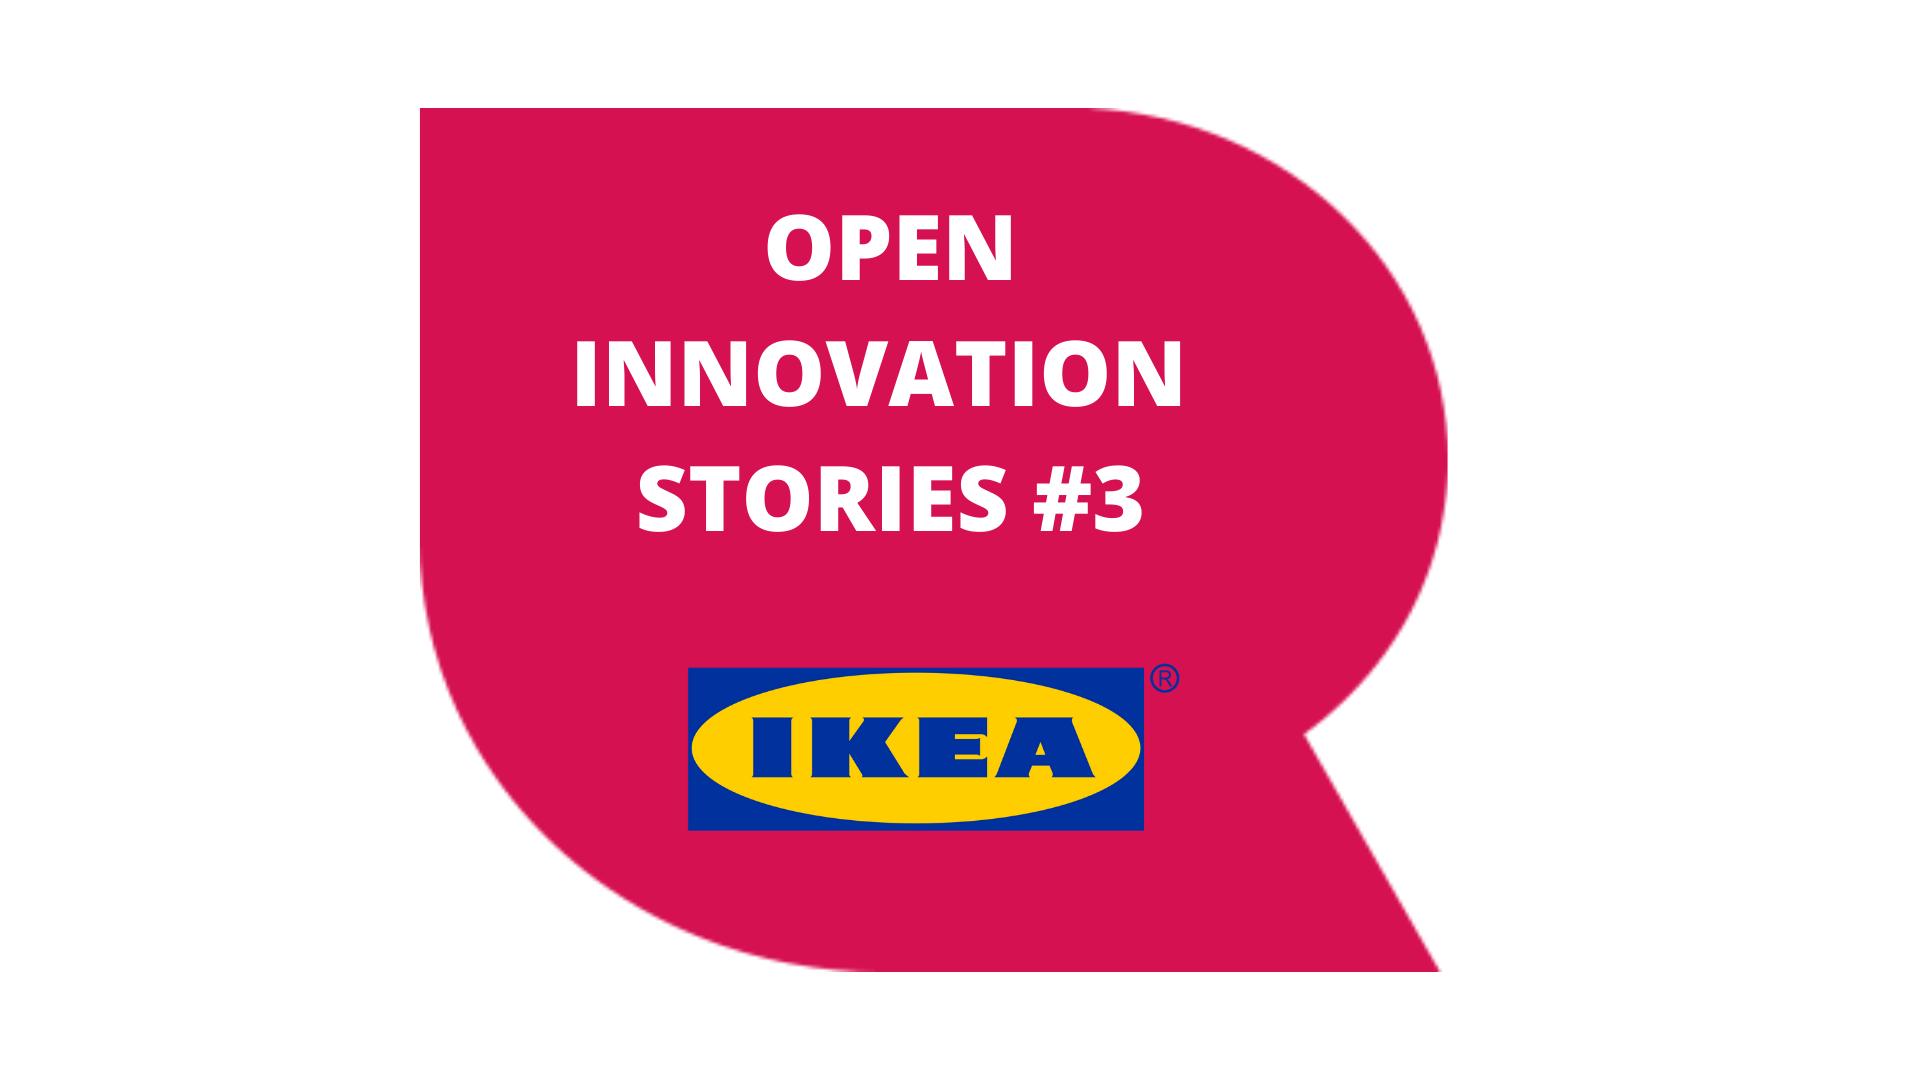 OPEN INNOVATION STORIES  #3